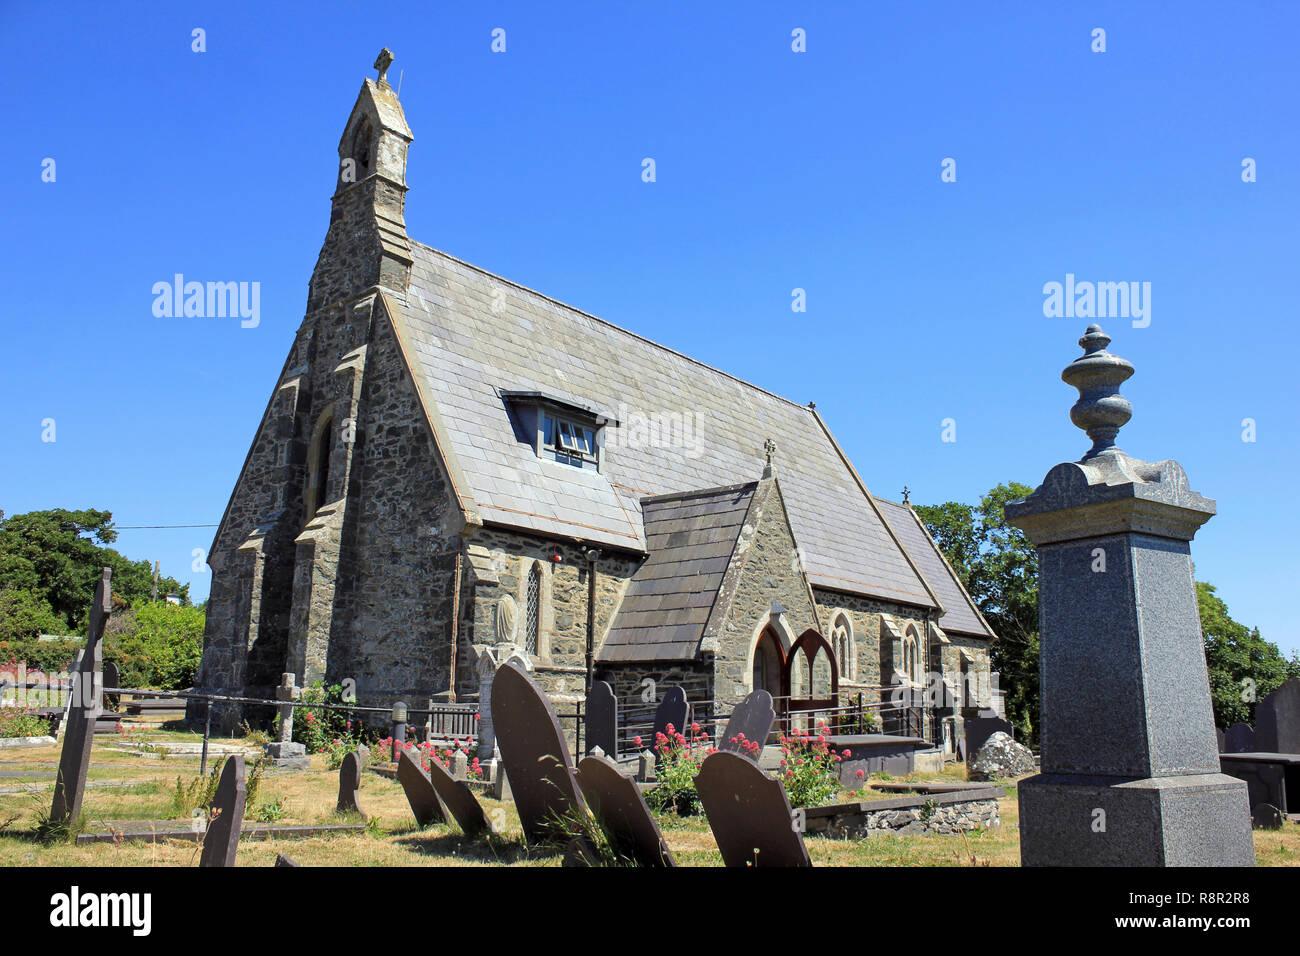 St Maelog's Church, Llanfaelog, Isle of Anglesey - Grade II Listed - Stock Image